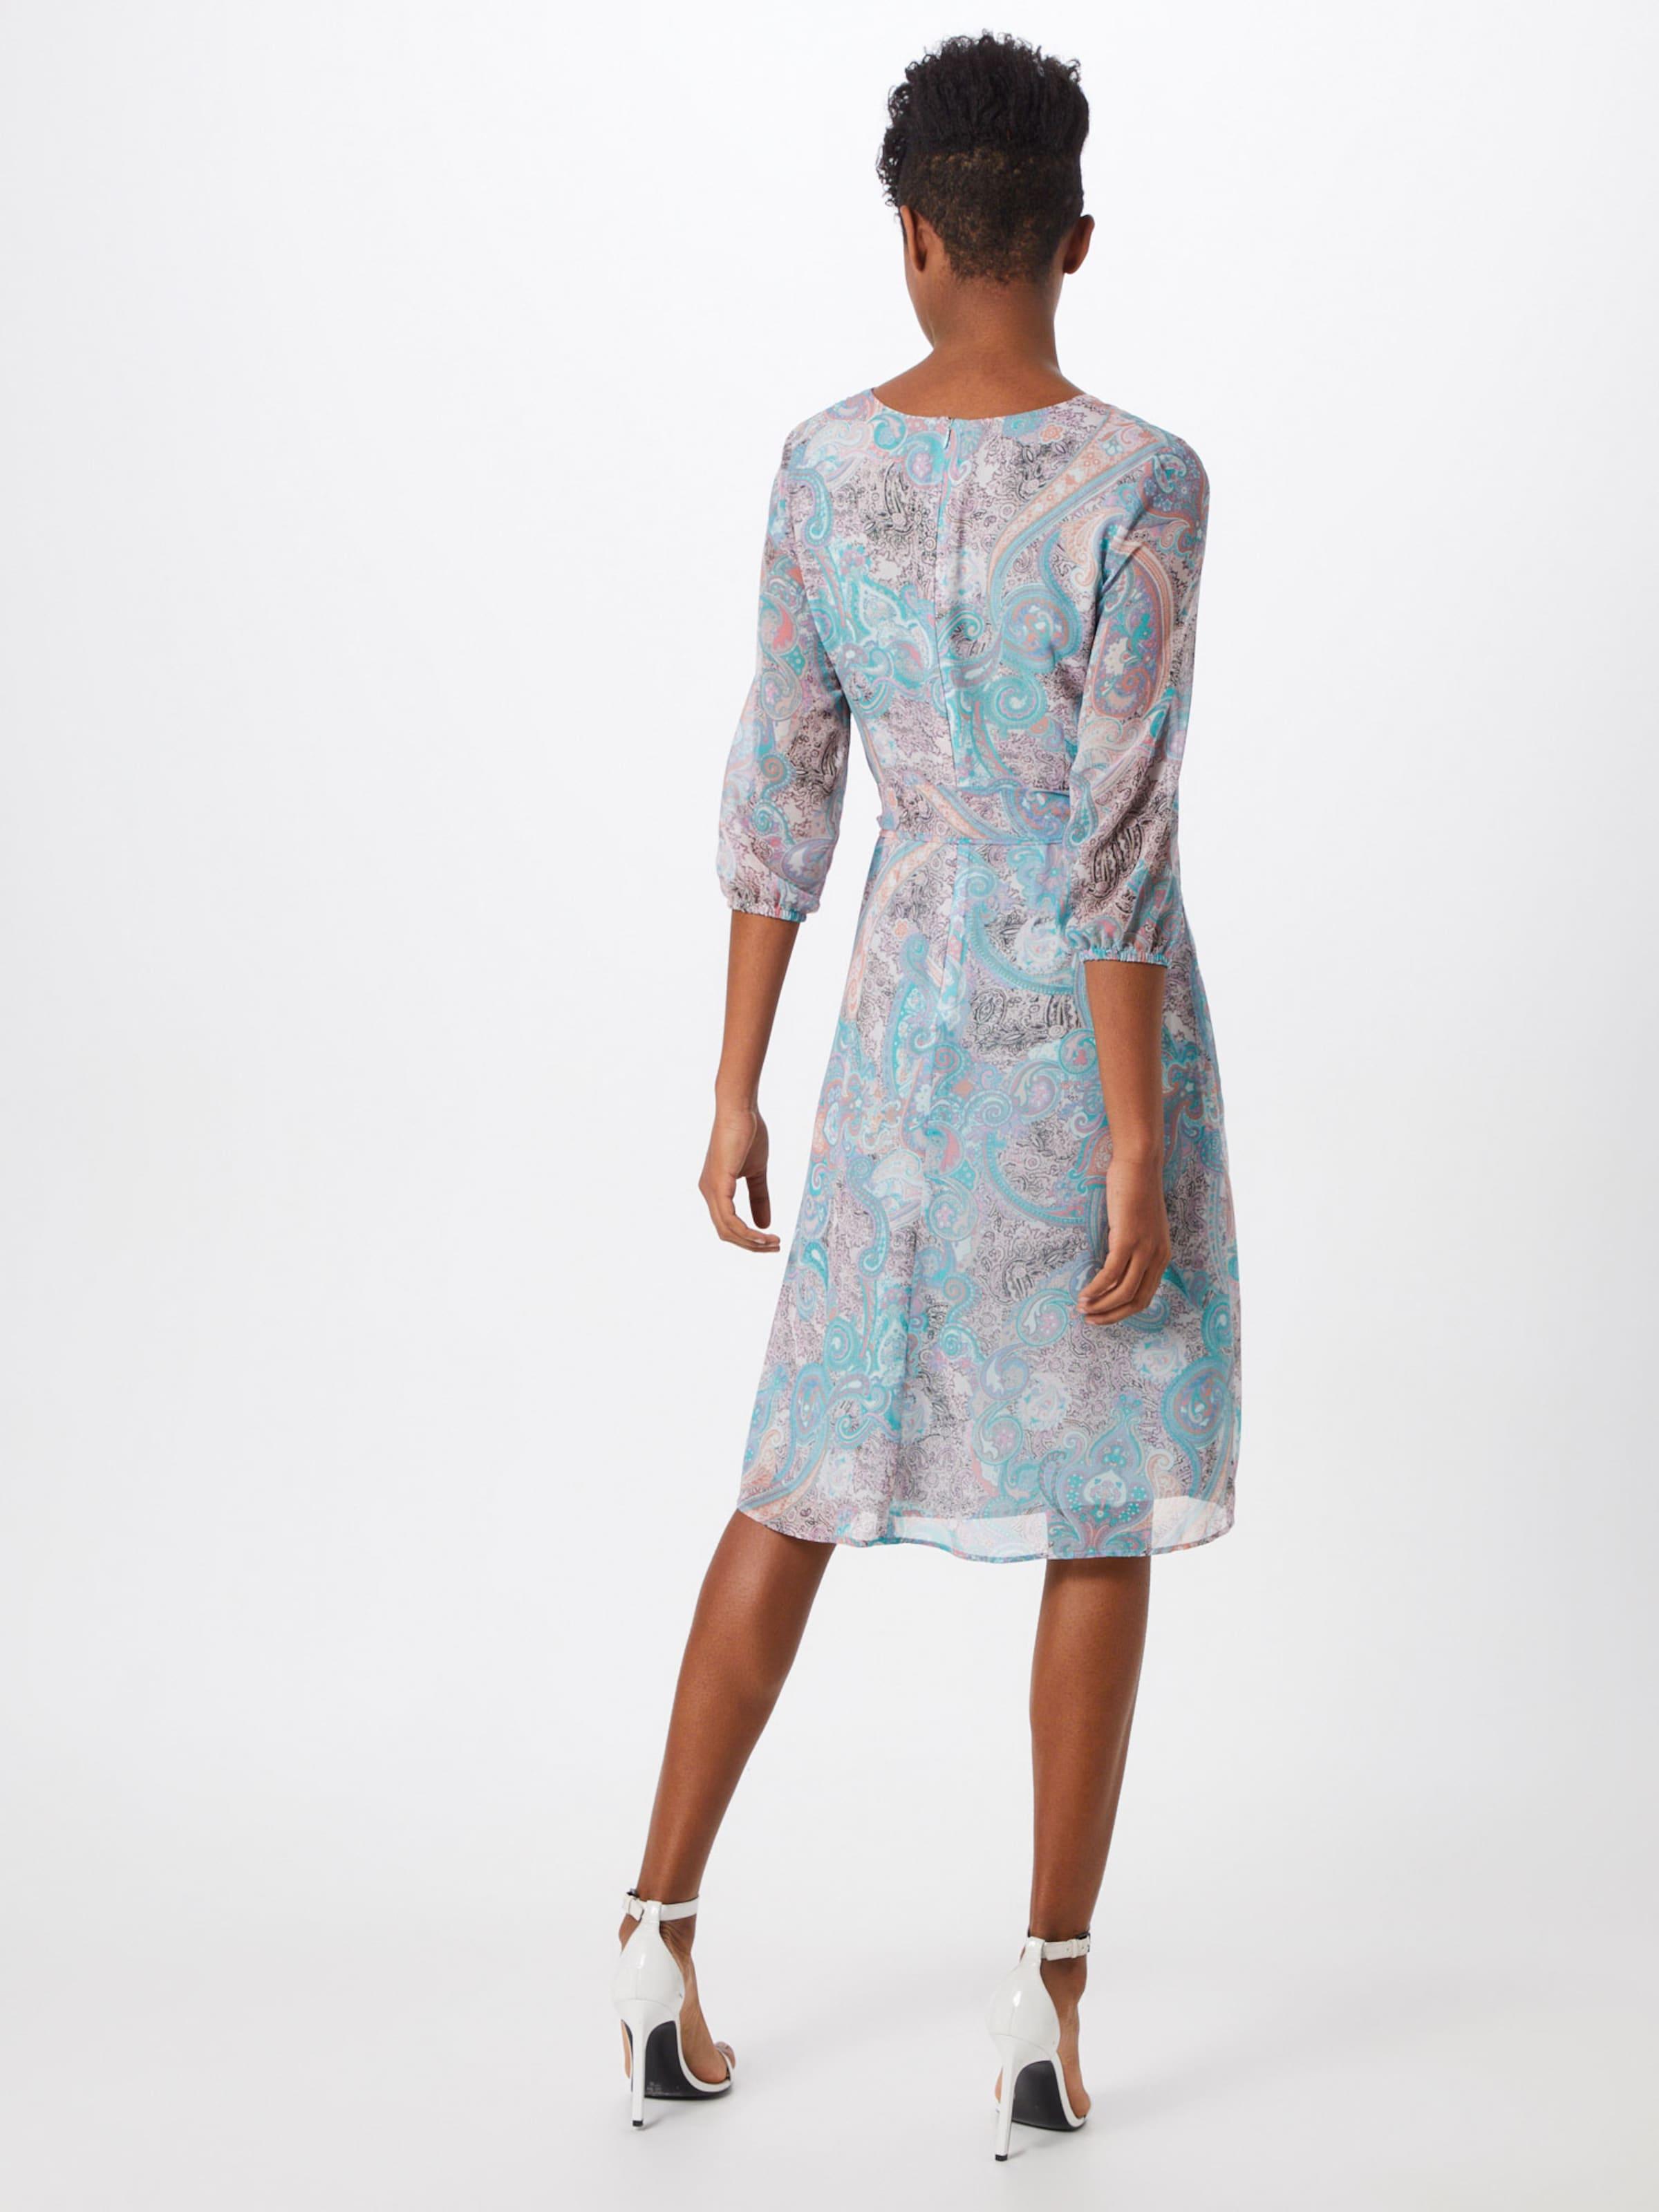 Kleid Moreamp; 'paisley' 'paisley' Kleid HellblauHelllila In Kleid HellblauHelllila Moreamp; Moreamp; In 'paisley' 5jARL34